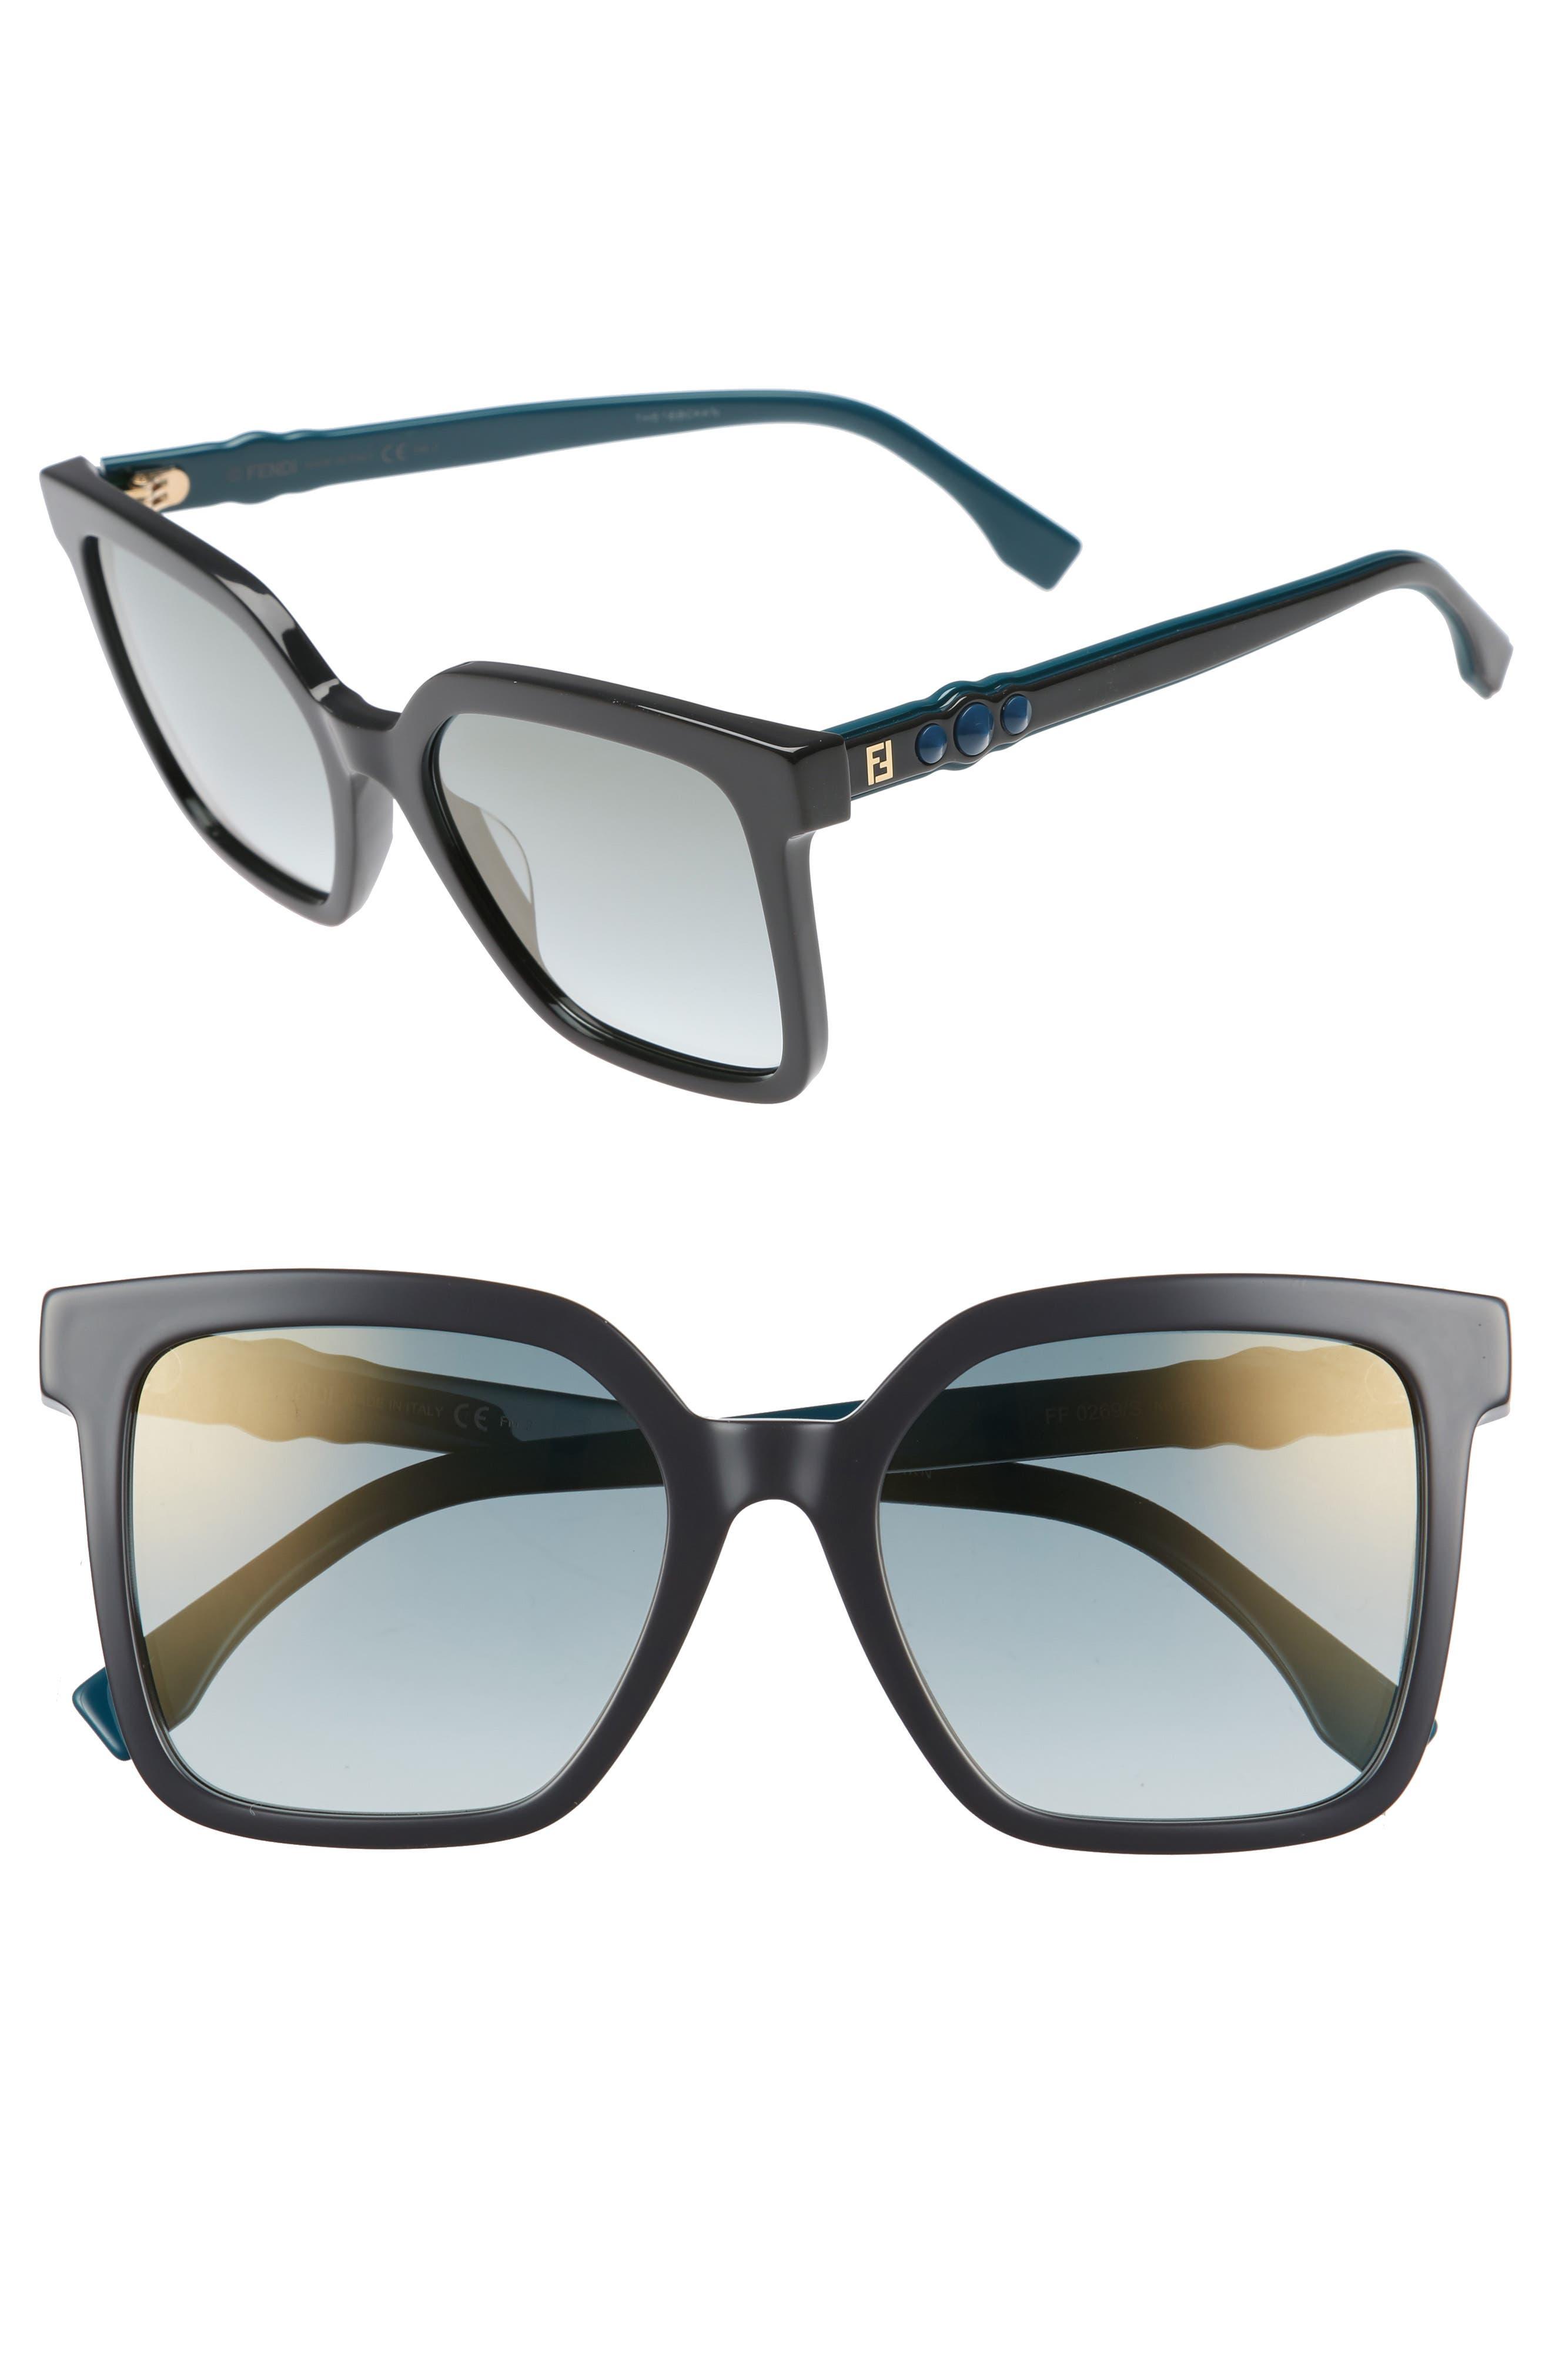 54mm Square Sunglasses,                             Main thumbnail 1, color,                             GREY